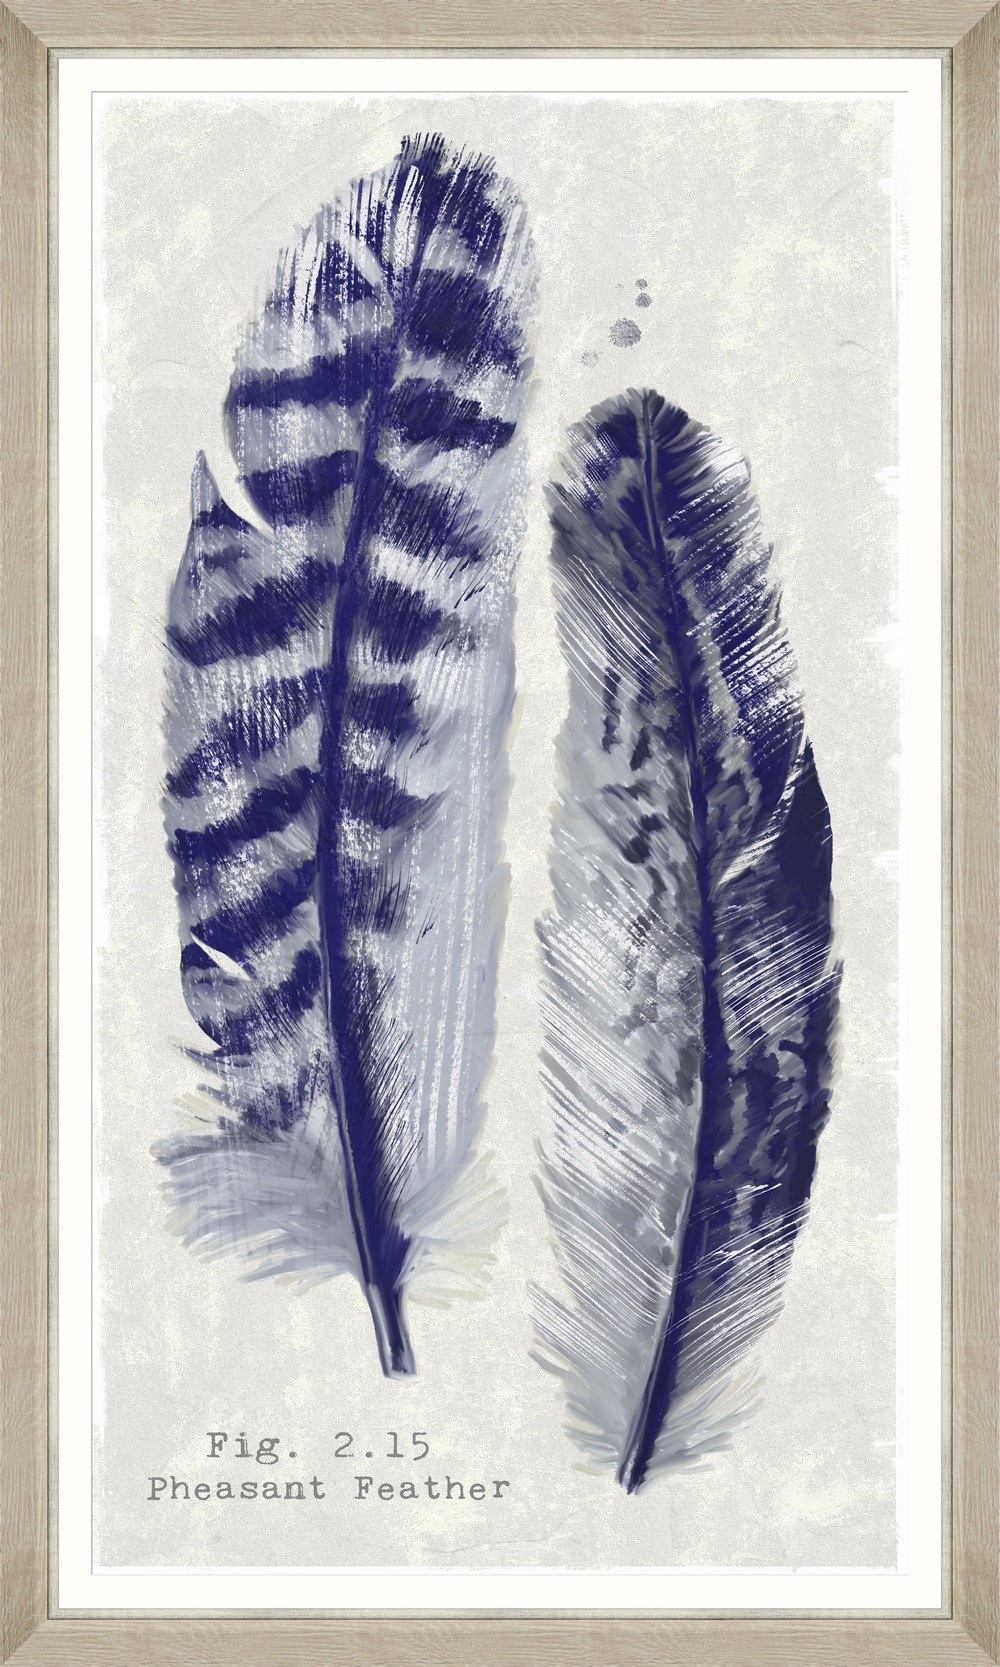 Tablou Framed Art Light As A Feather I imagine